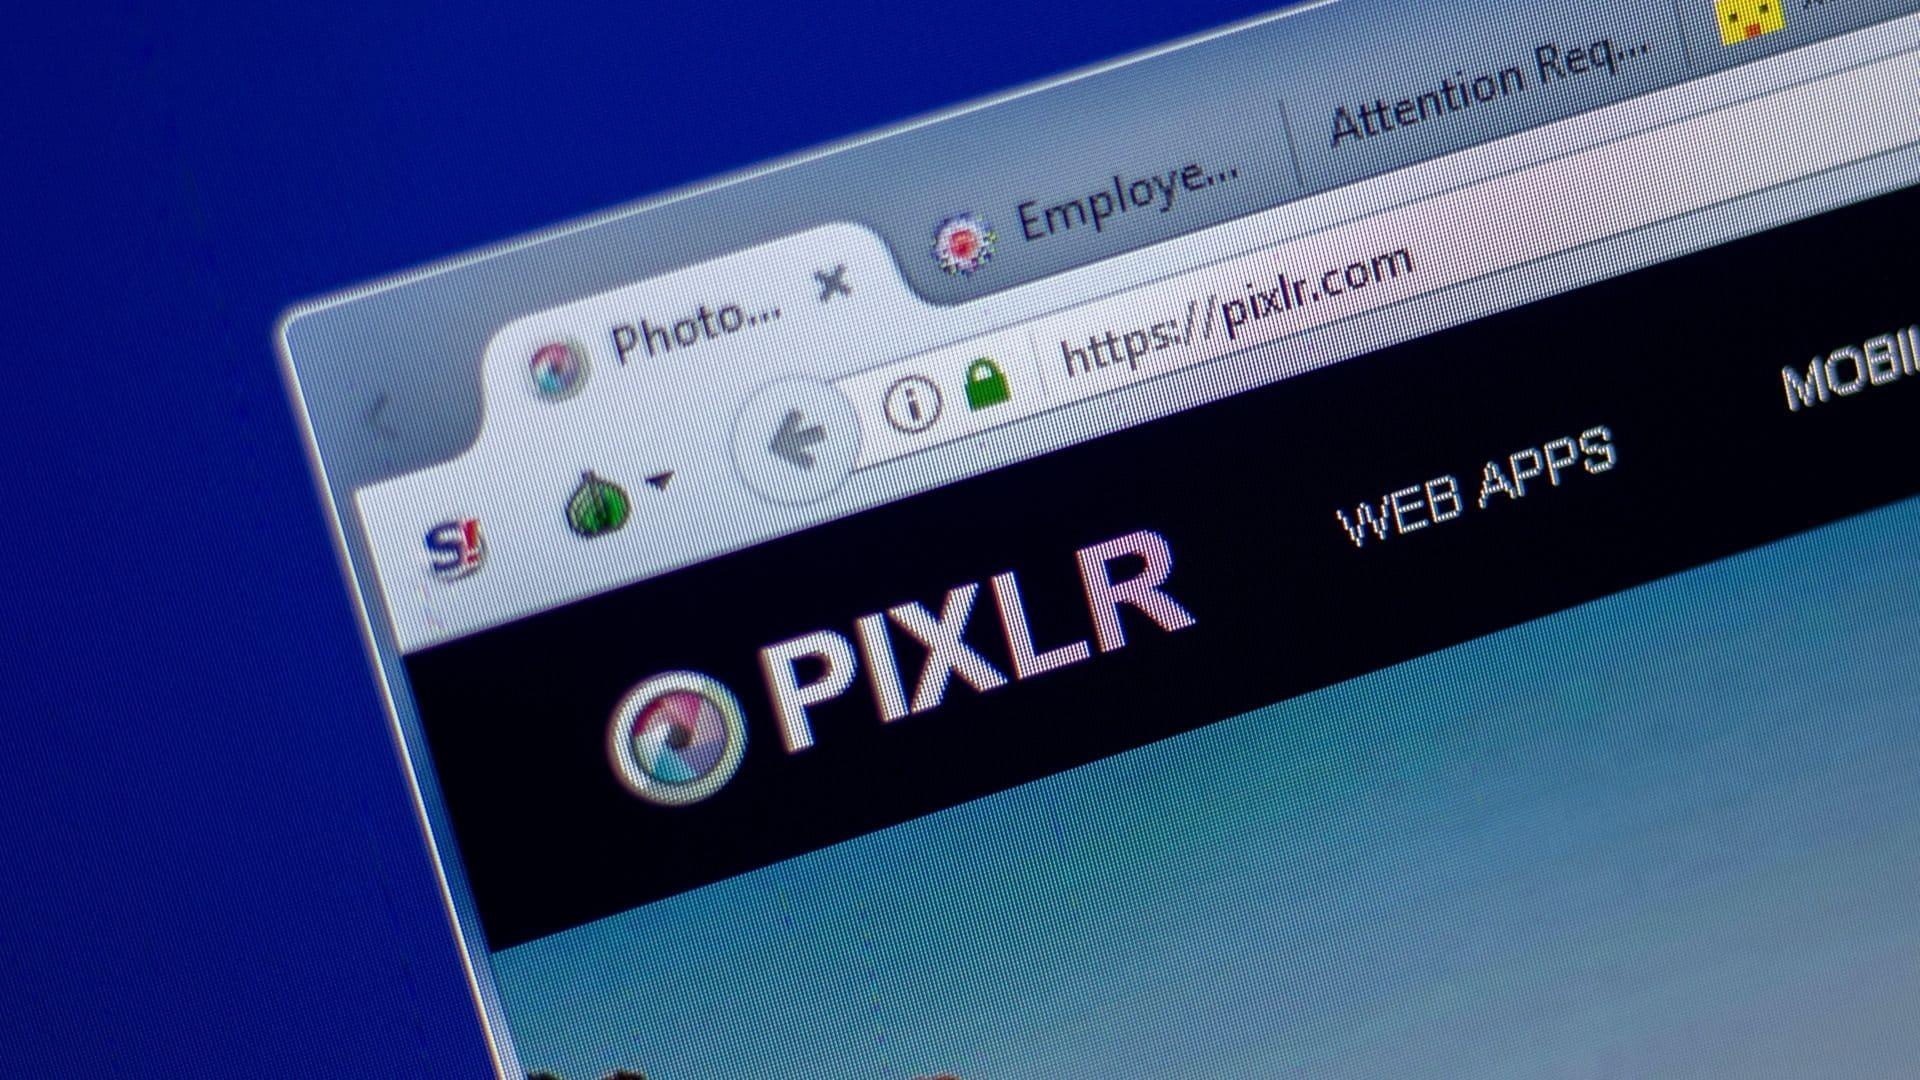 Página da web mostra editor de fotos para PC Pixlr